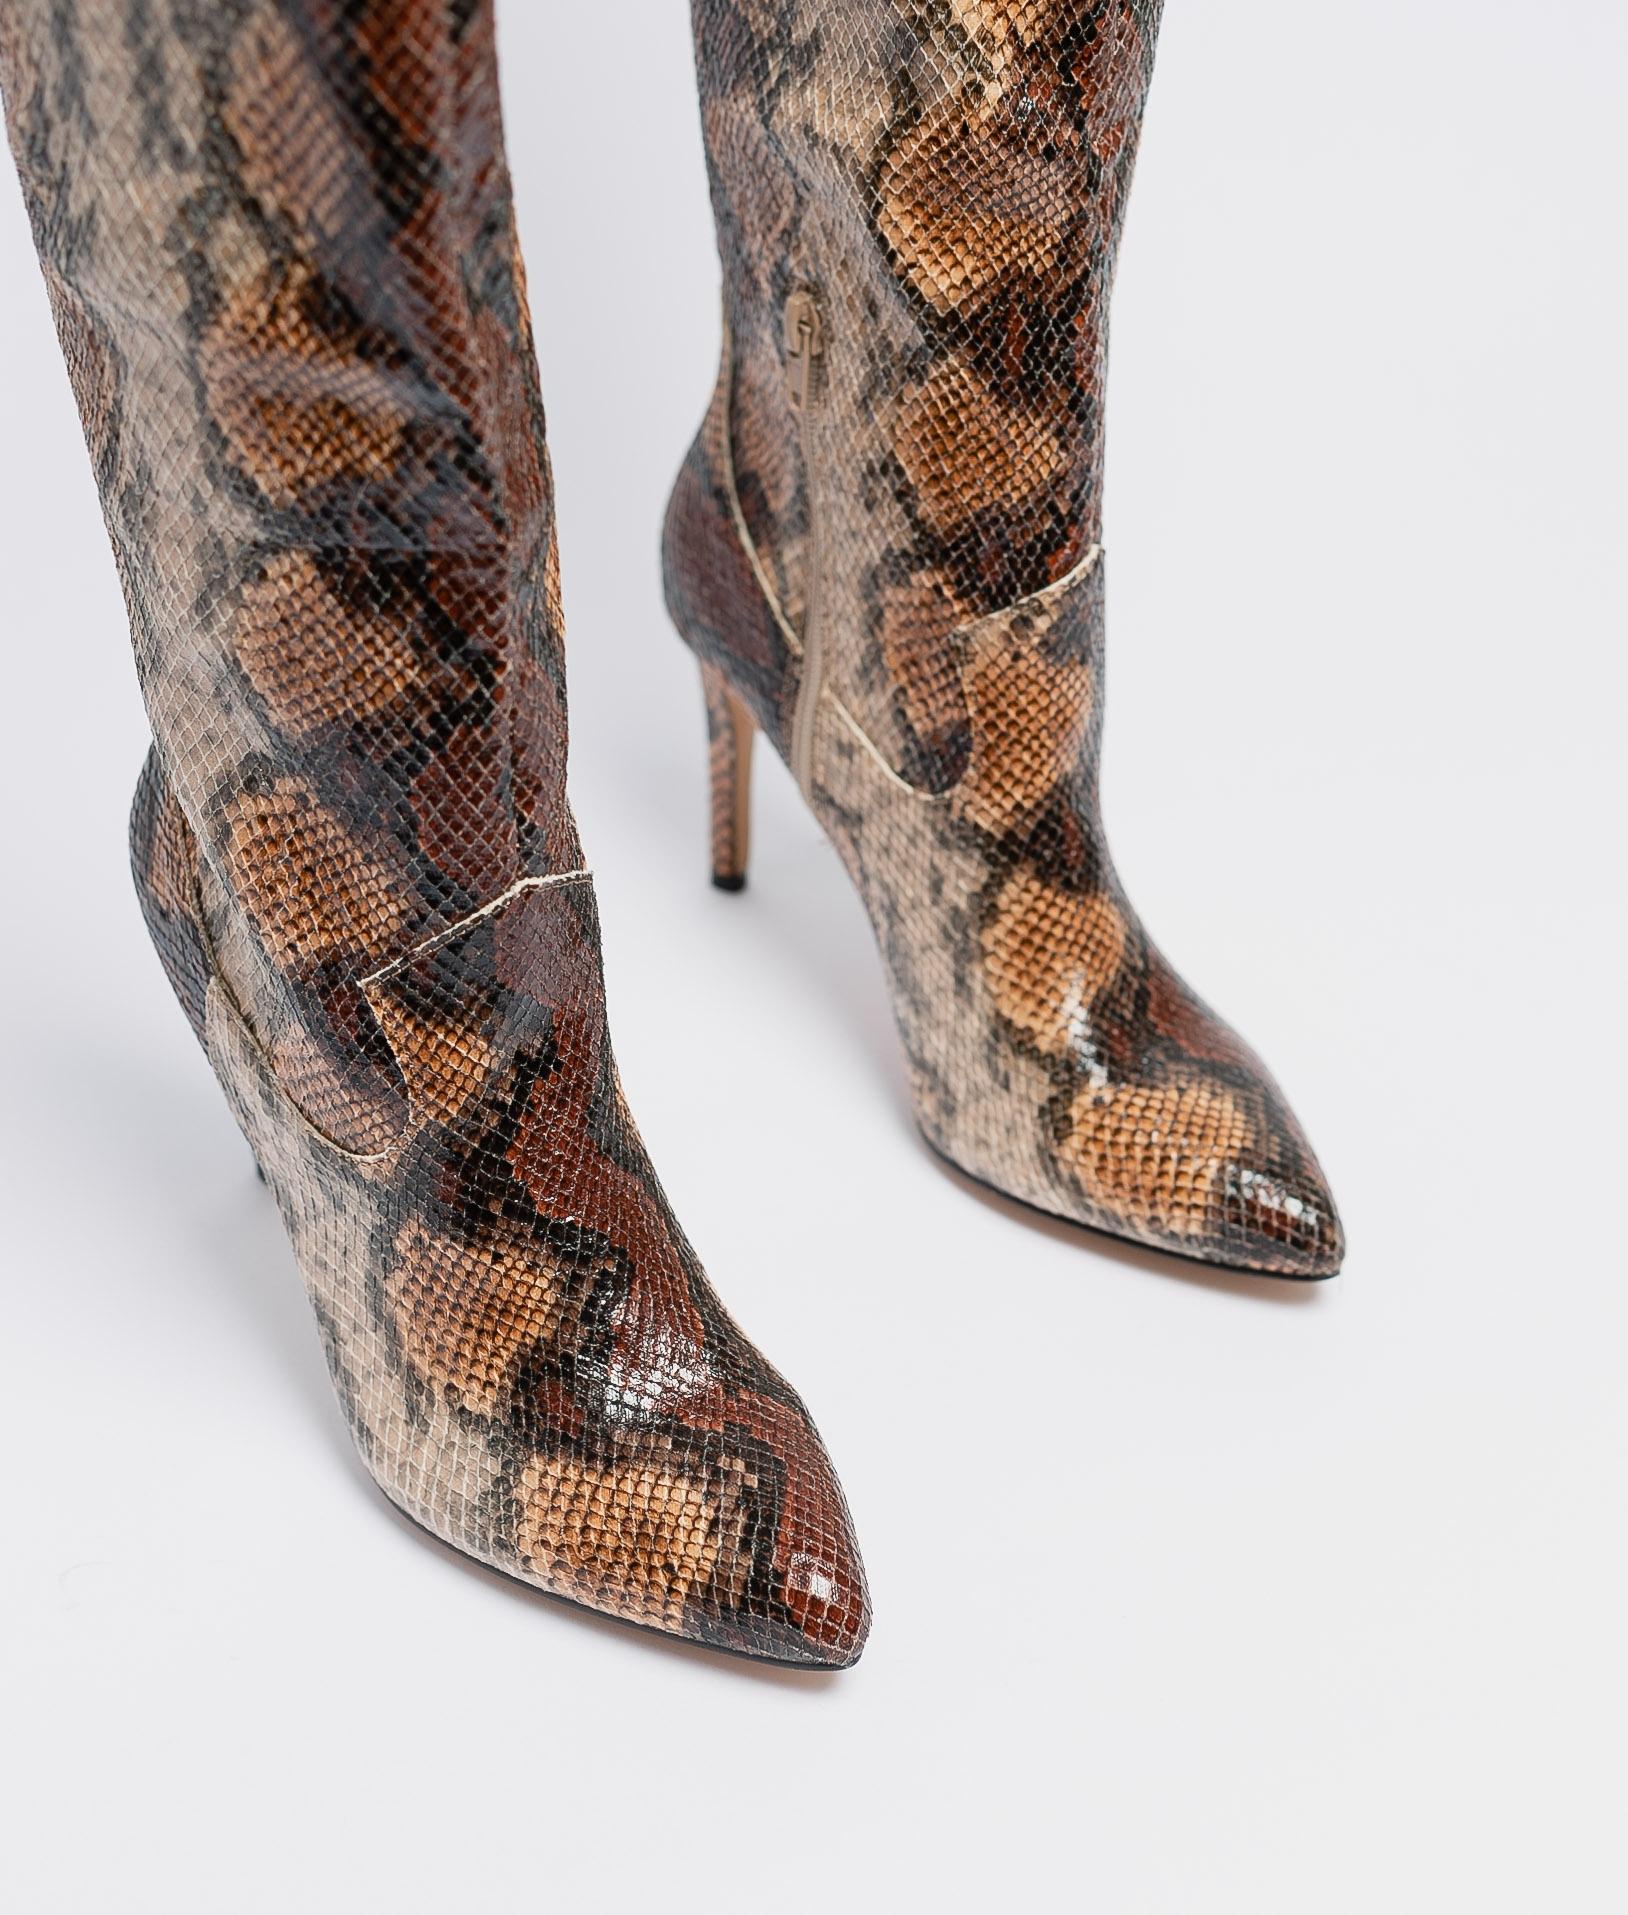 Botte Cuissarde Diante - Serpent